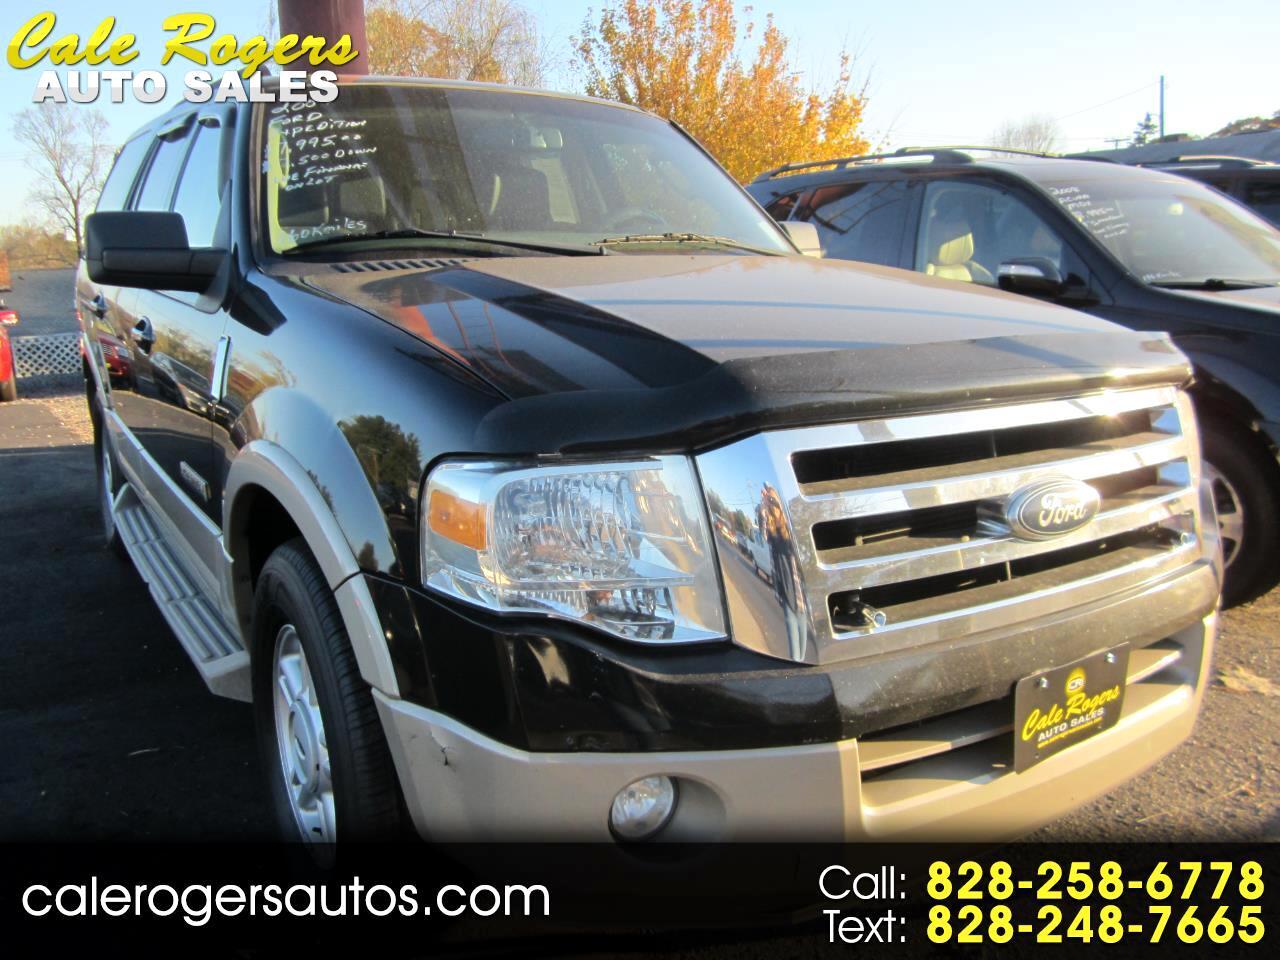 2007 Ford Expedition Eddie Bauer 2WD